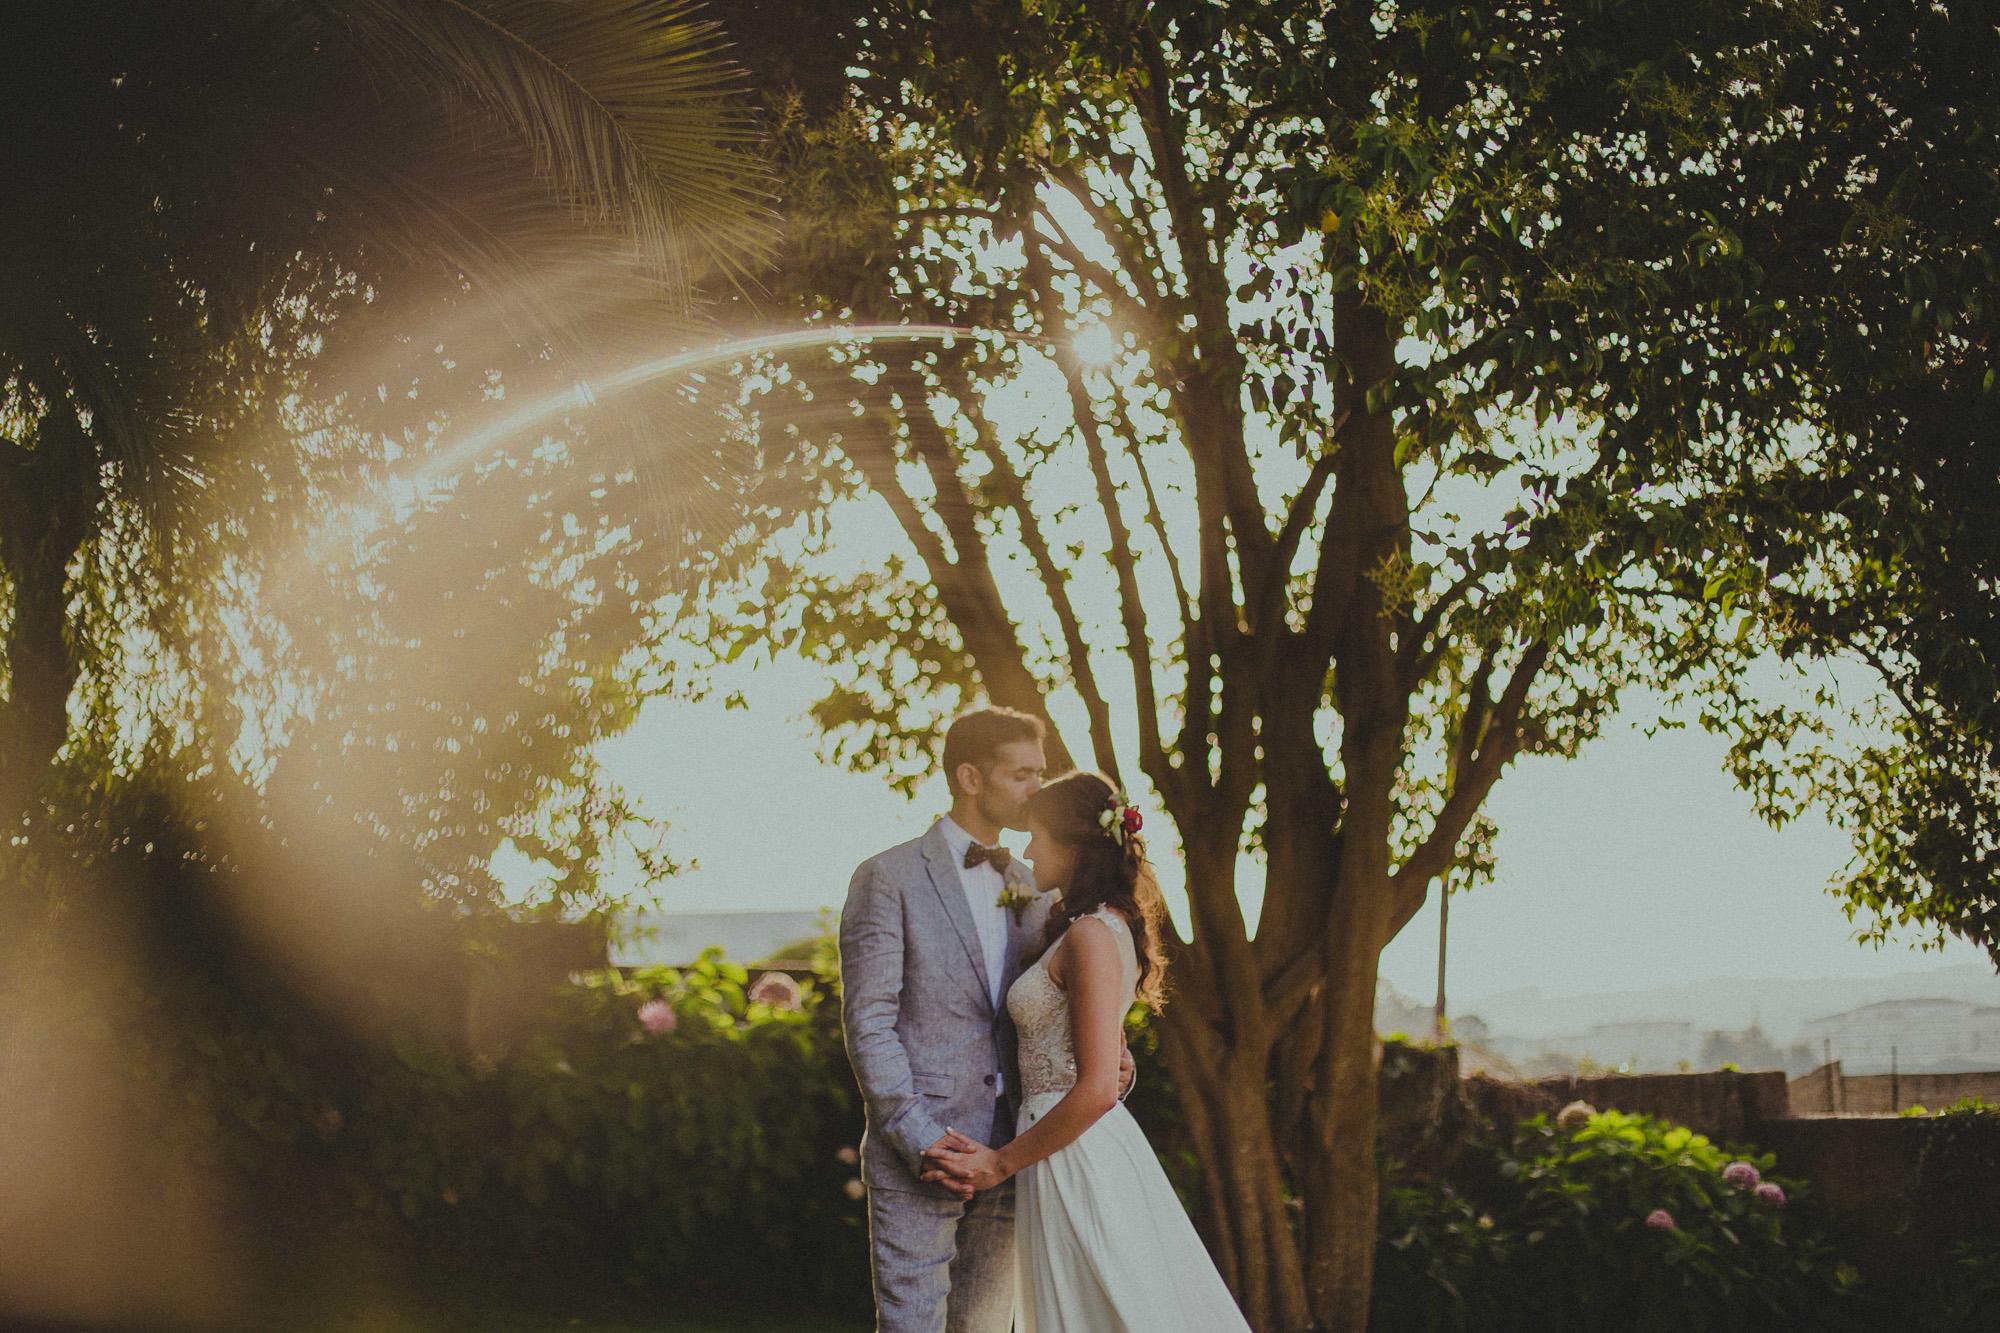 028-carina-e-samuel-wedding-casamento-quinta-dos-rouxinois-rustico-my-fancy-wedding-mafra-malveira-lisboa-sintra-cascais-filipe-santiago-fotografia-fotografo-lifestyle-destination-portugal